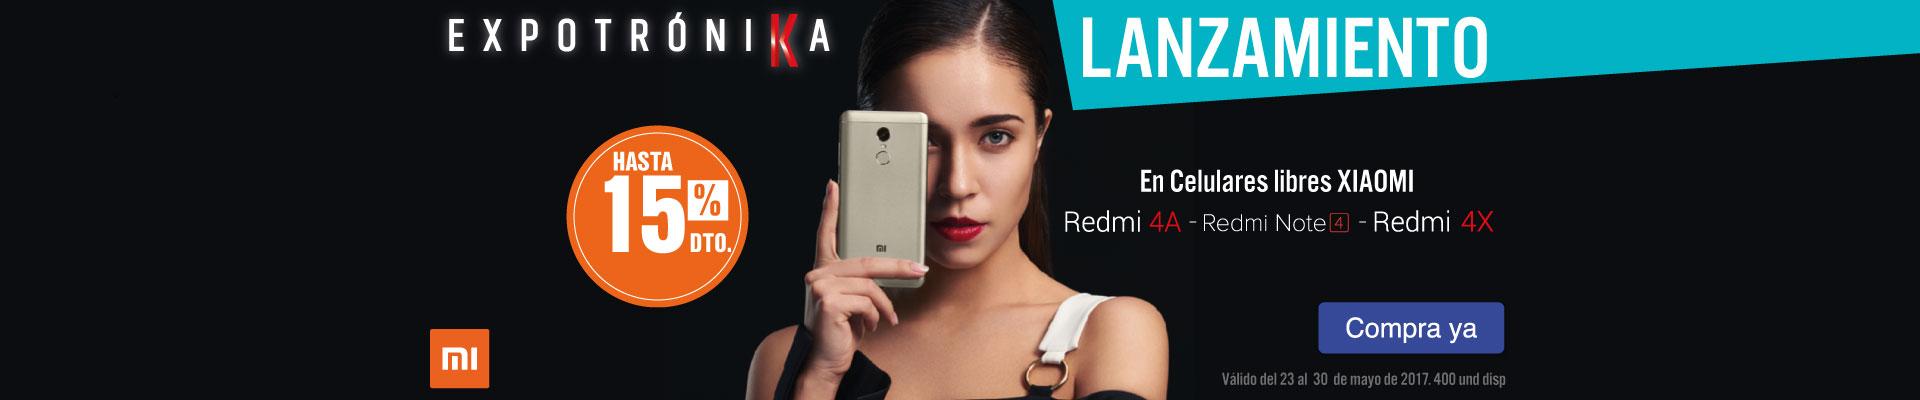 Pauta Xiaomi - Bppal KT - Lanzamiento Celular Xiaomi - May23